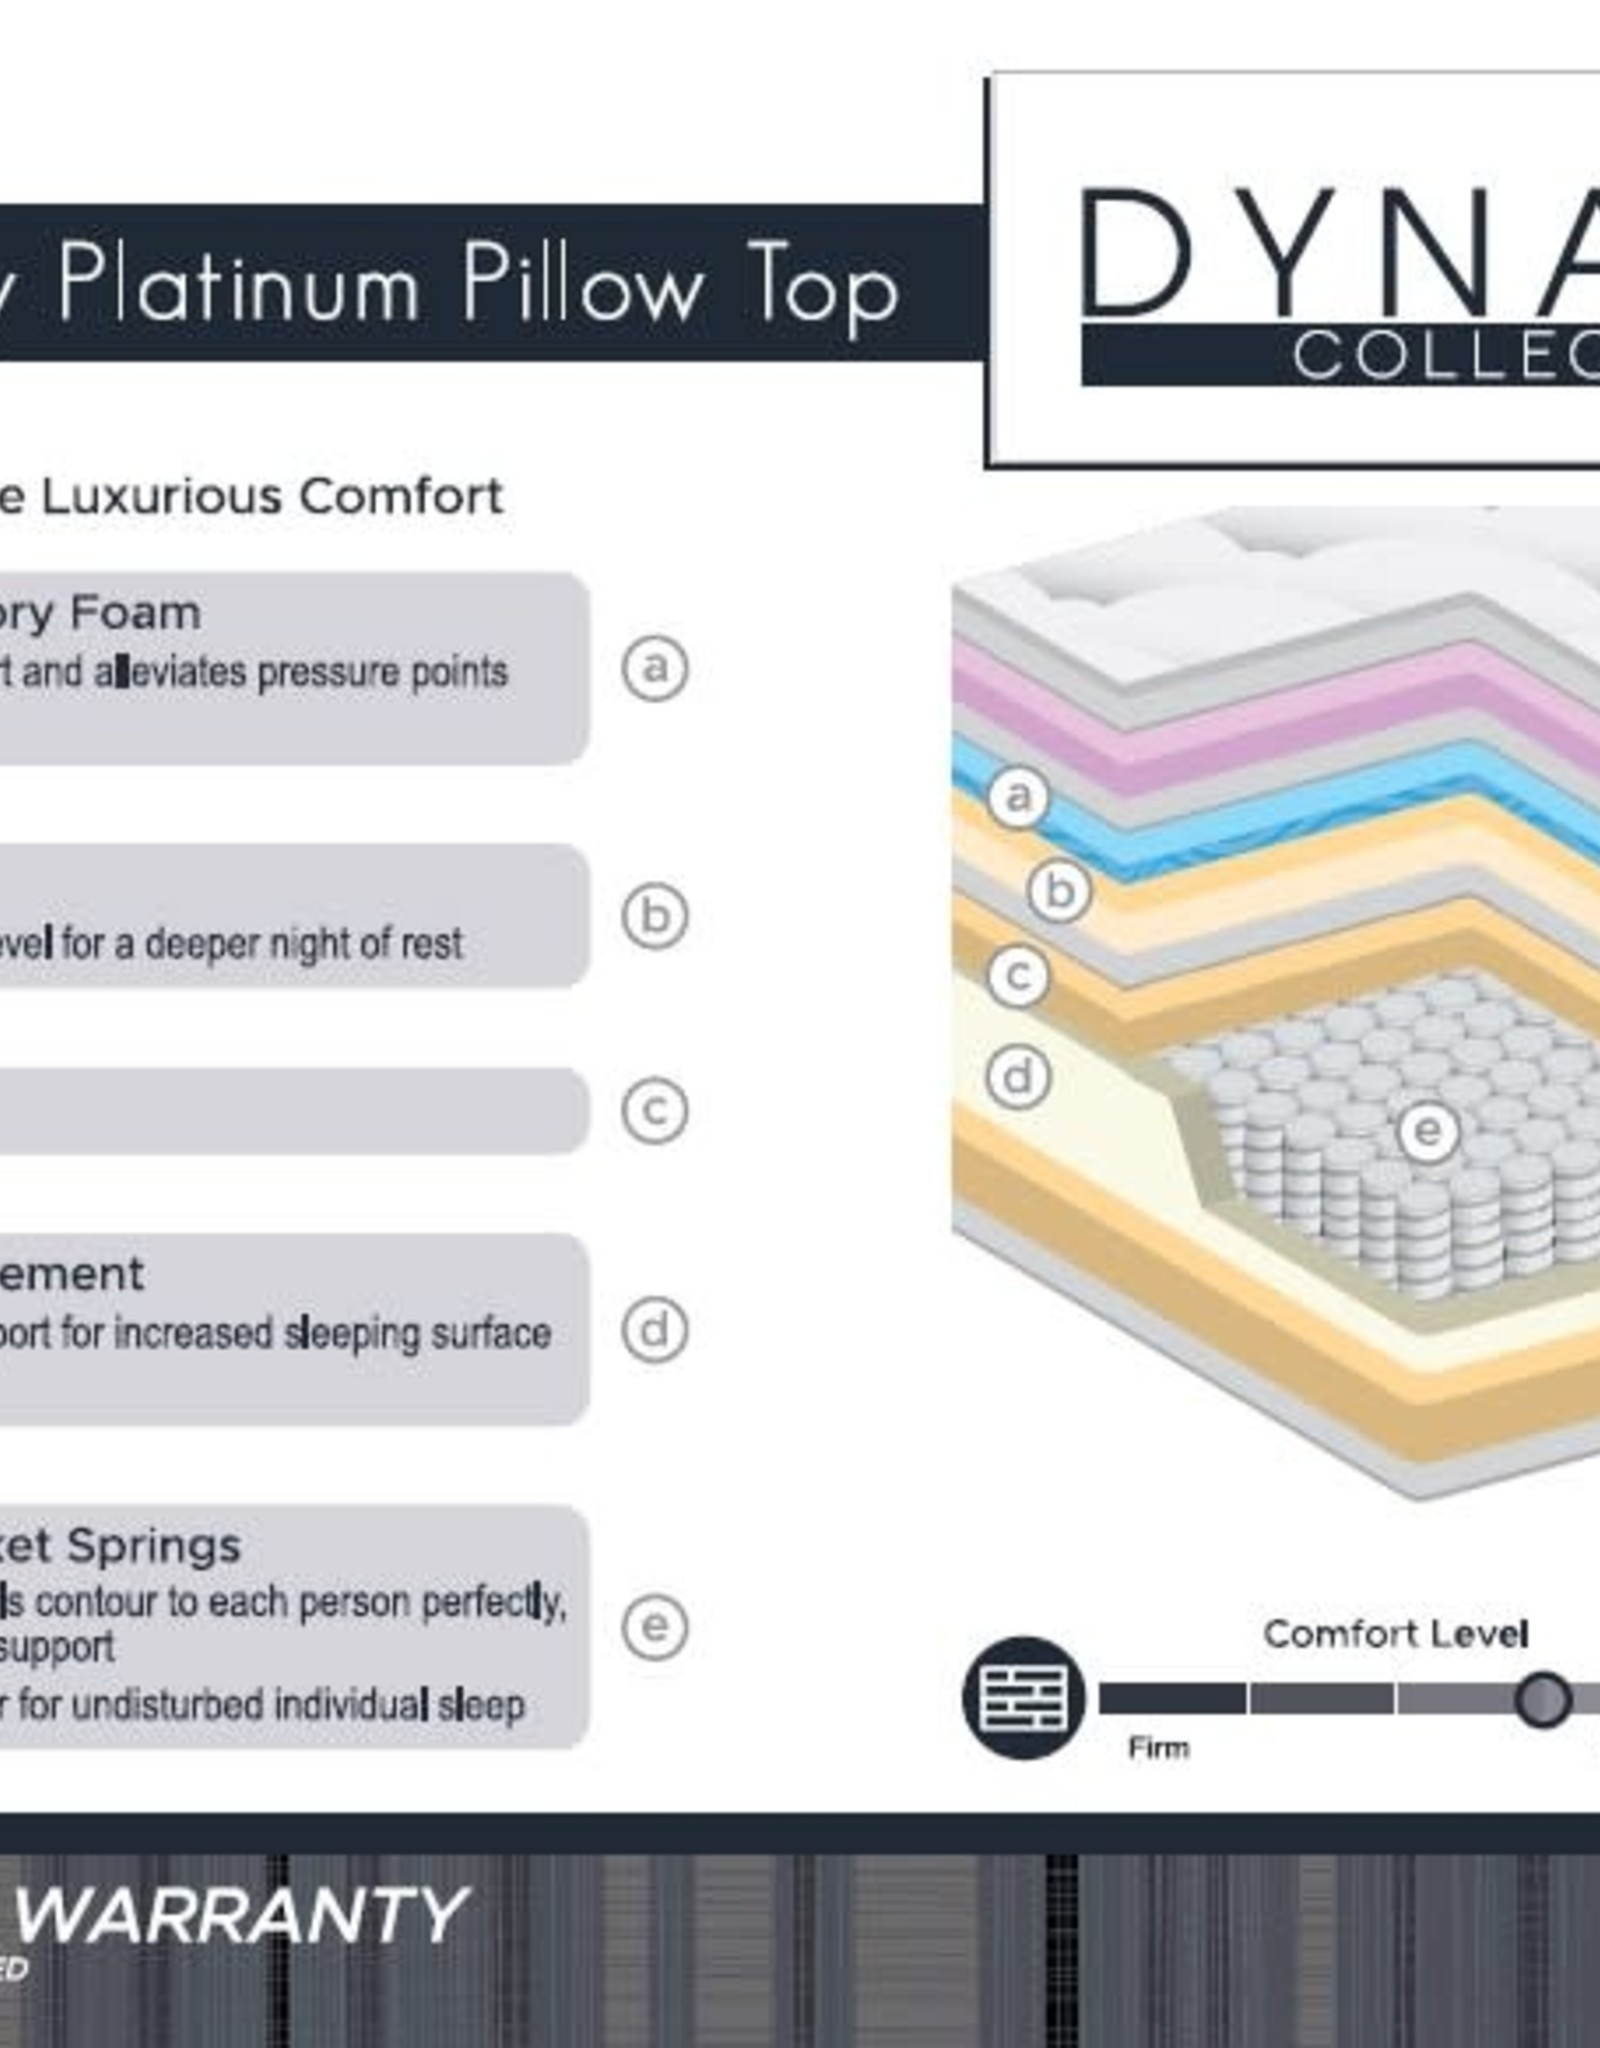 Corsicana C1 Carraway Platinum Pillowtop One-Sided Mattress only